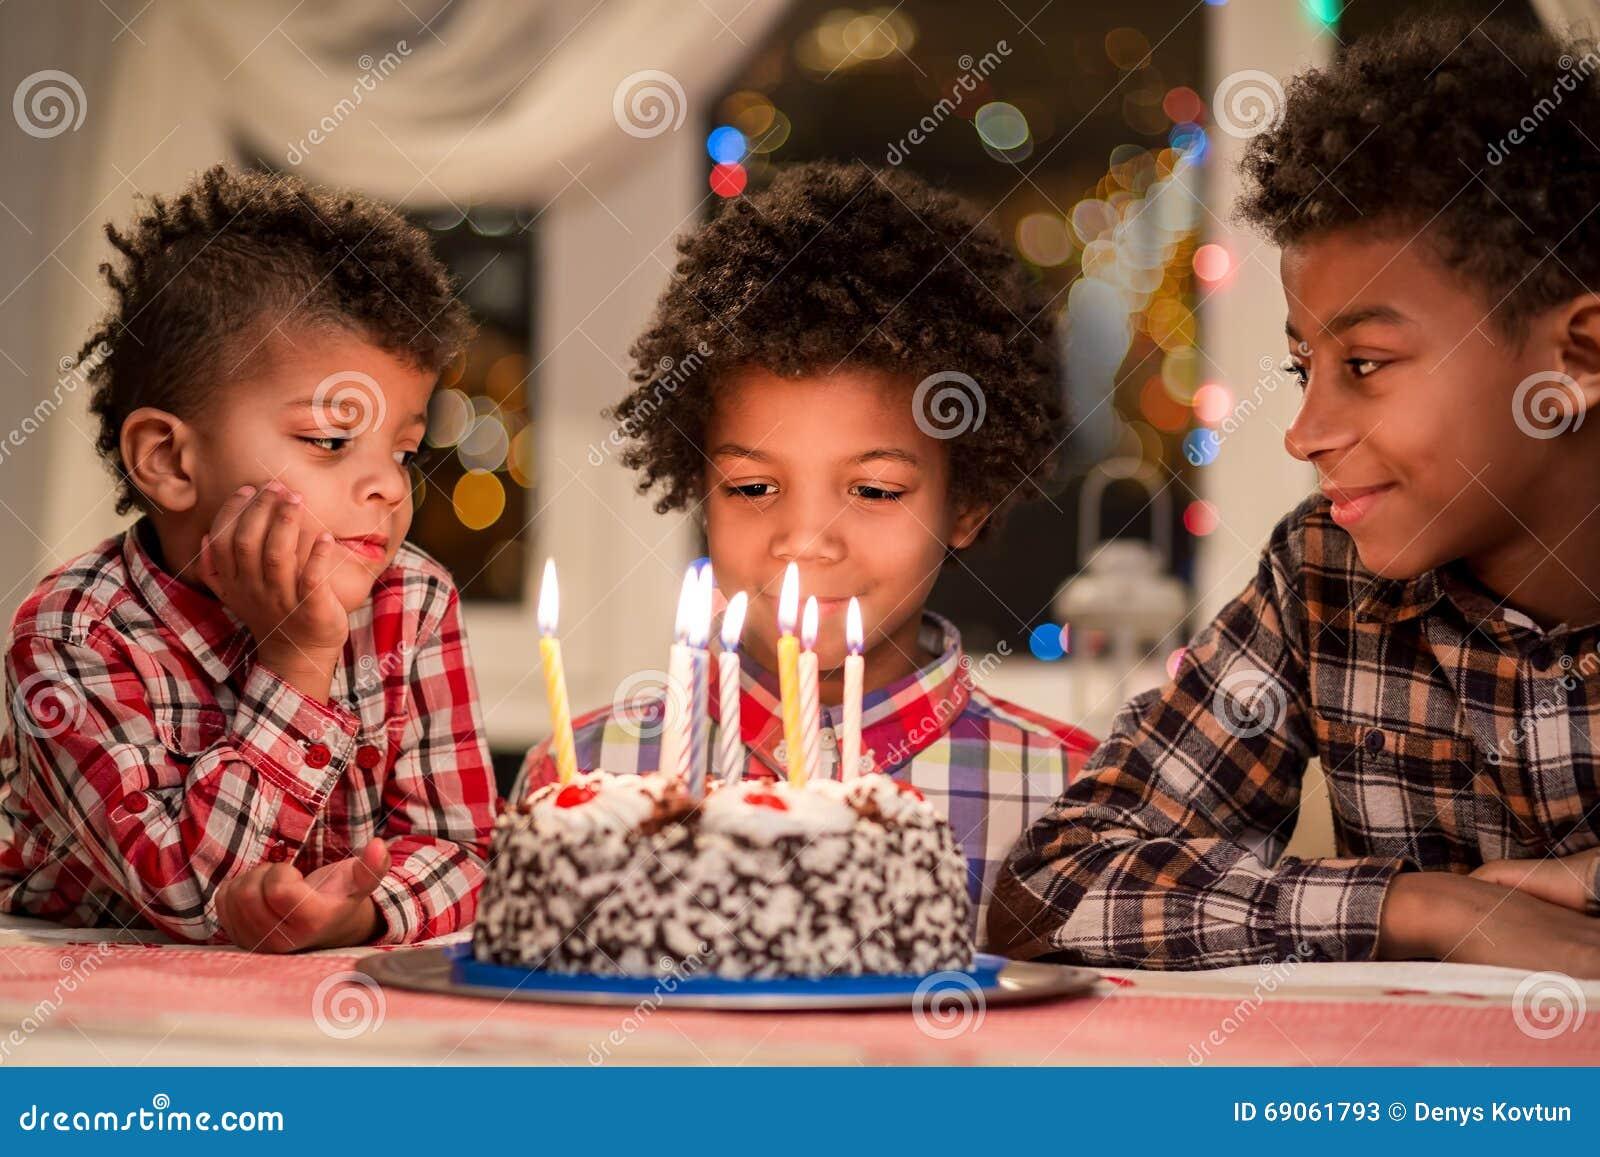 Afro boys and birthday cake.